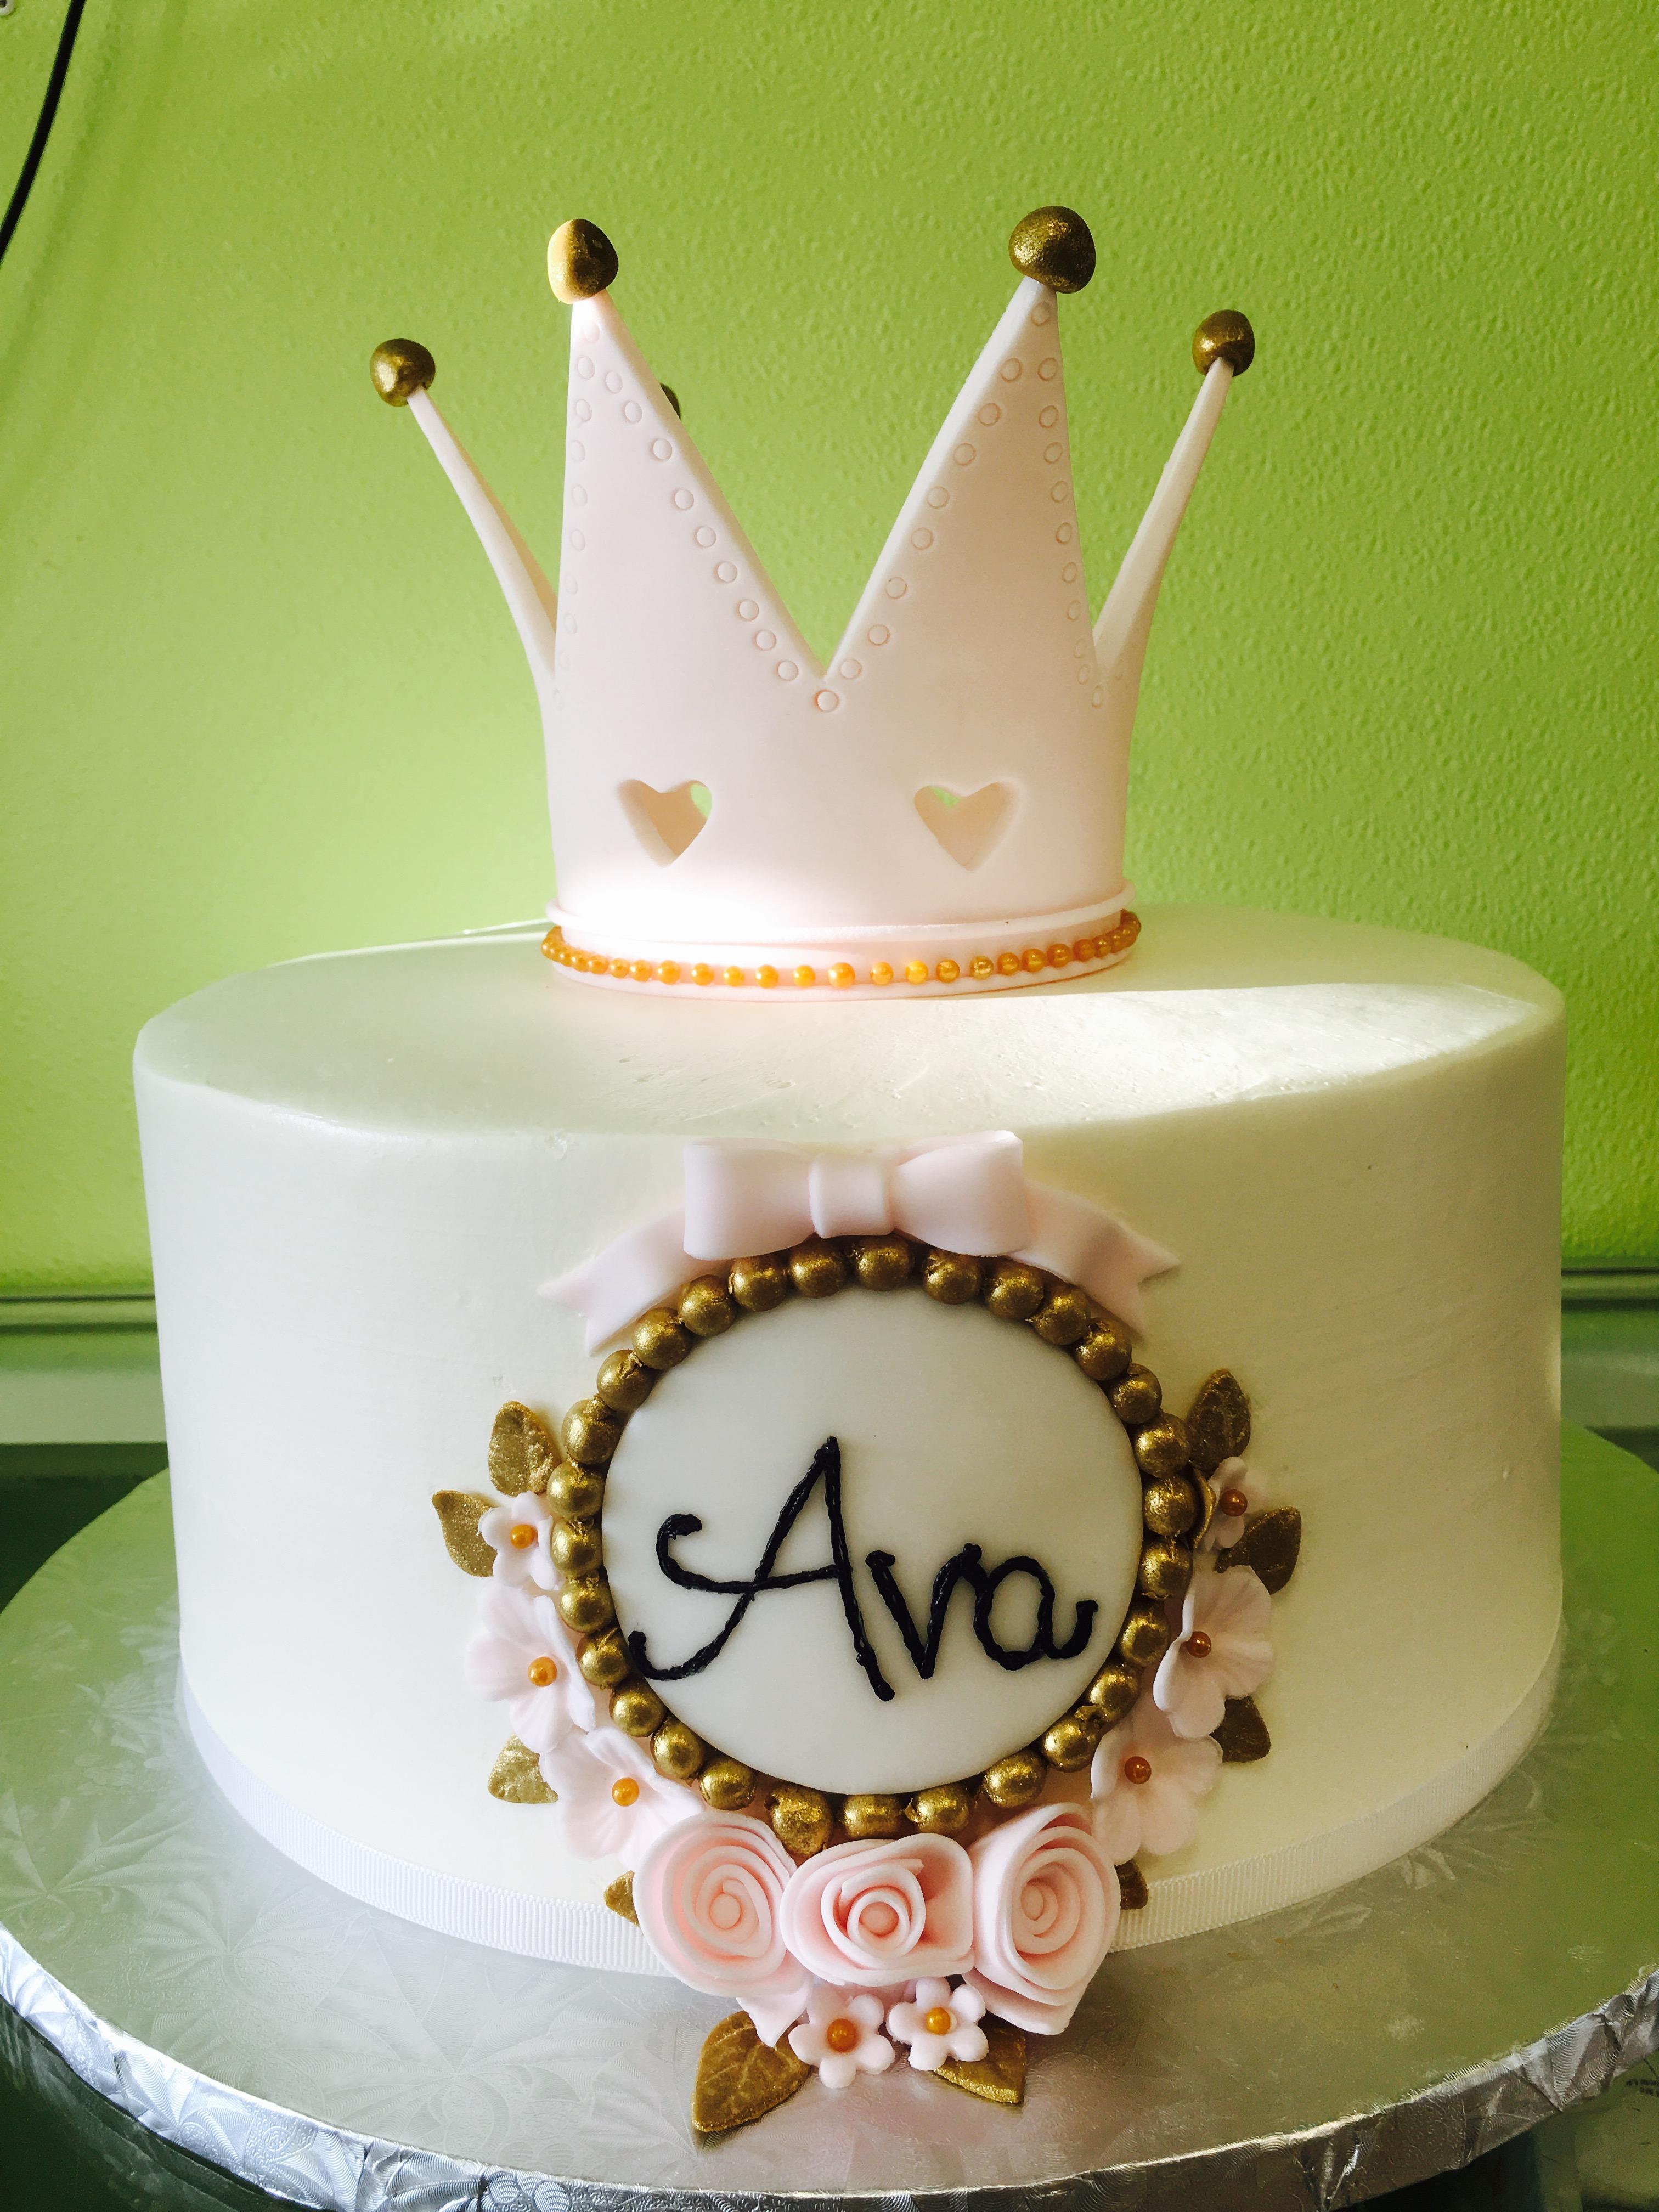 3049, birthday, princess, crown, tiara, queen, pink, white, gold, heart, hearts, flower, flowers